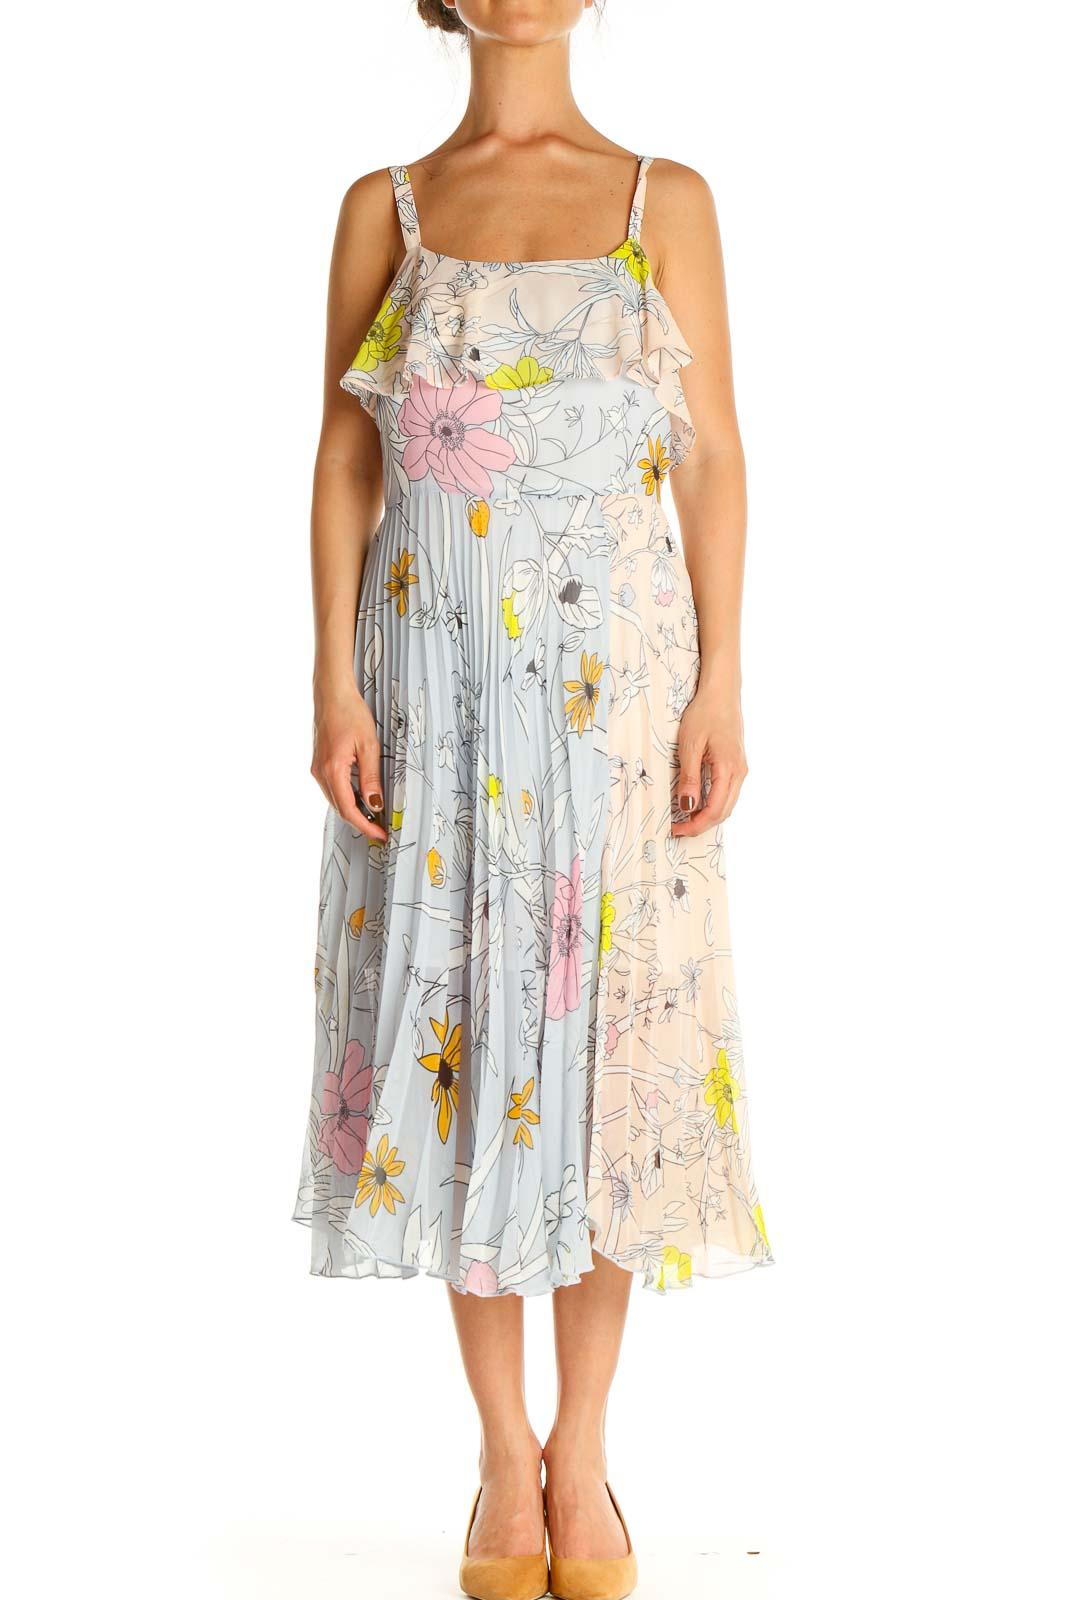 Beige Floral Print Fit & Flare Dress Front